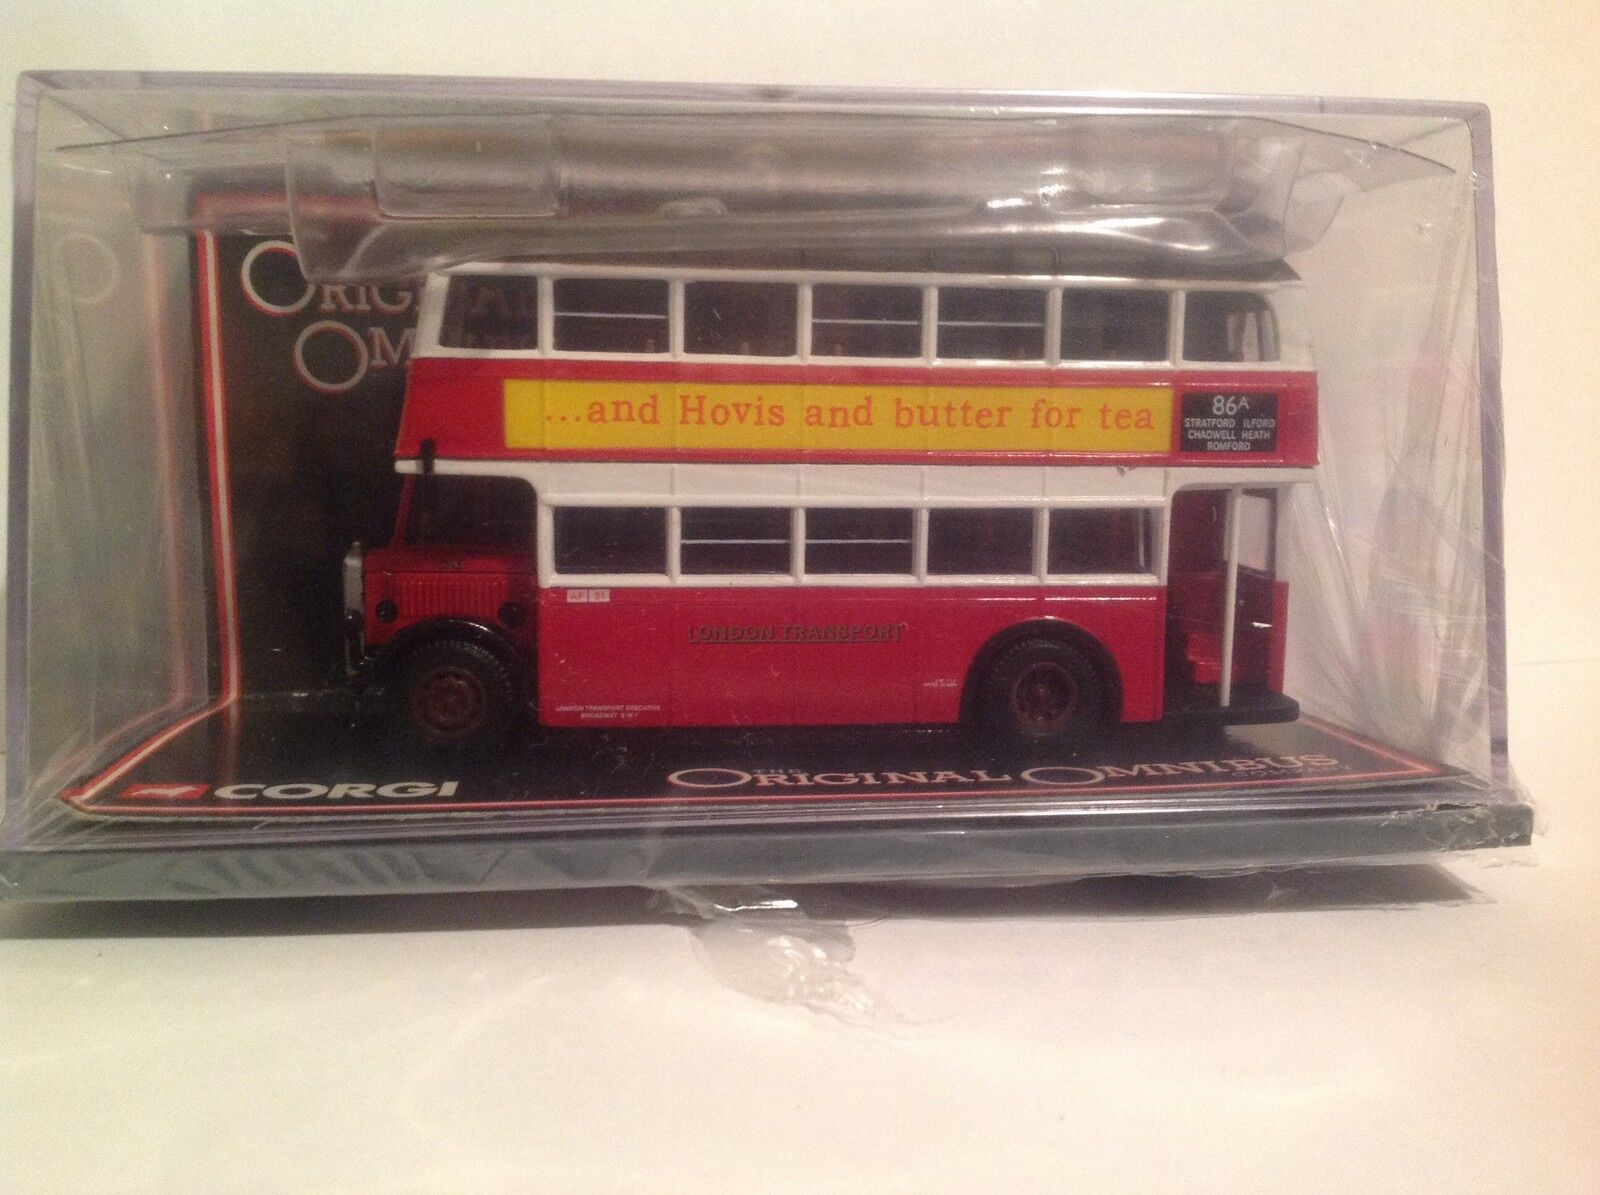 OM43907 Guy Arab Untilty Bus London Transport LTD 0002 of 4000